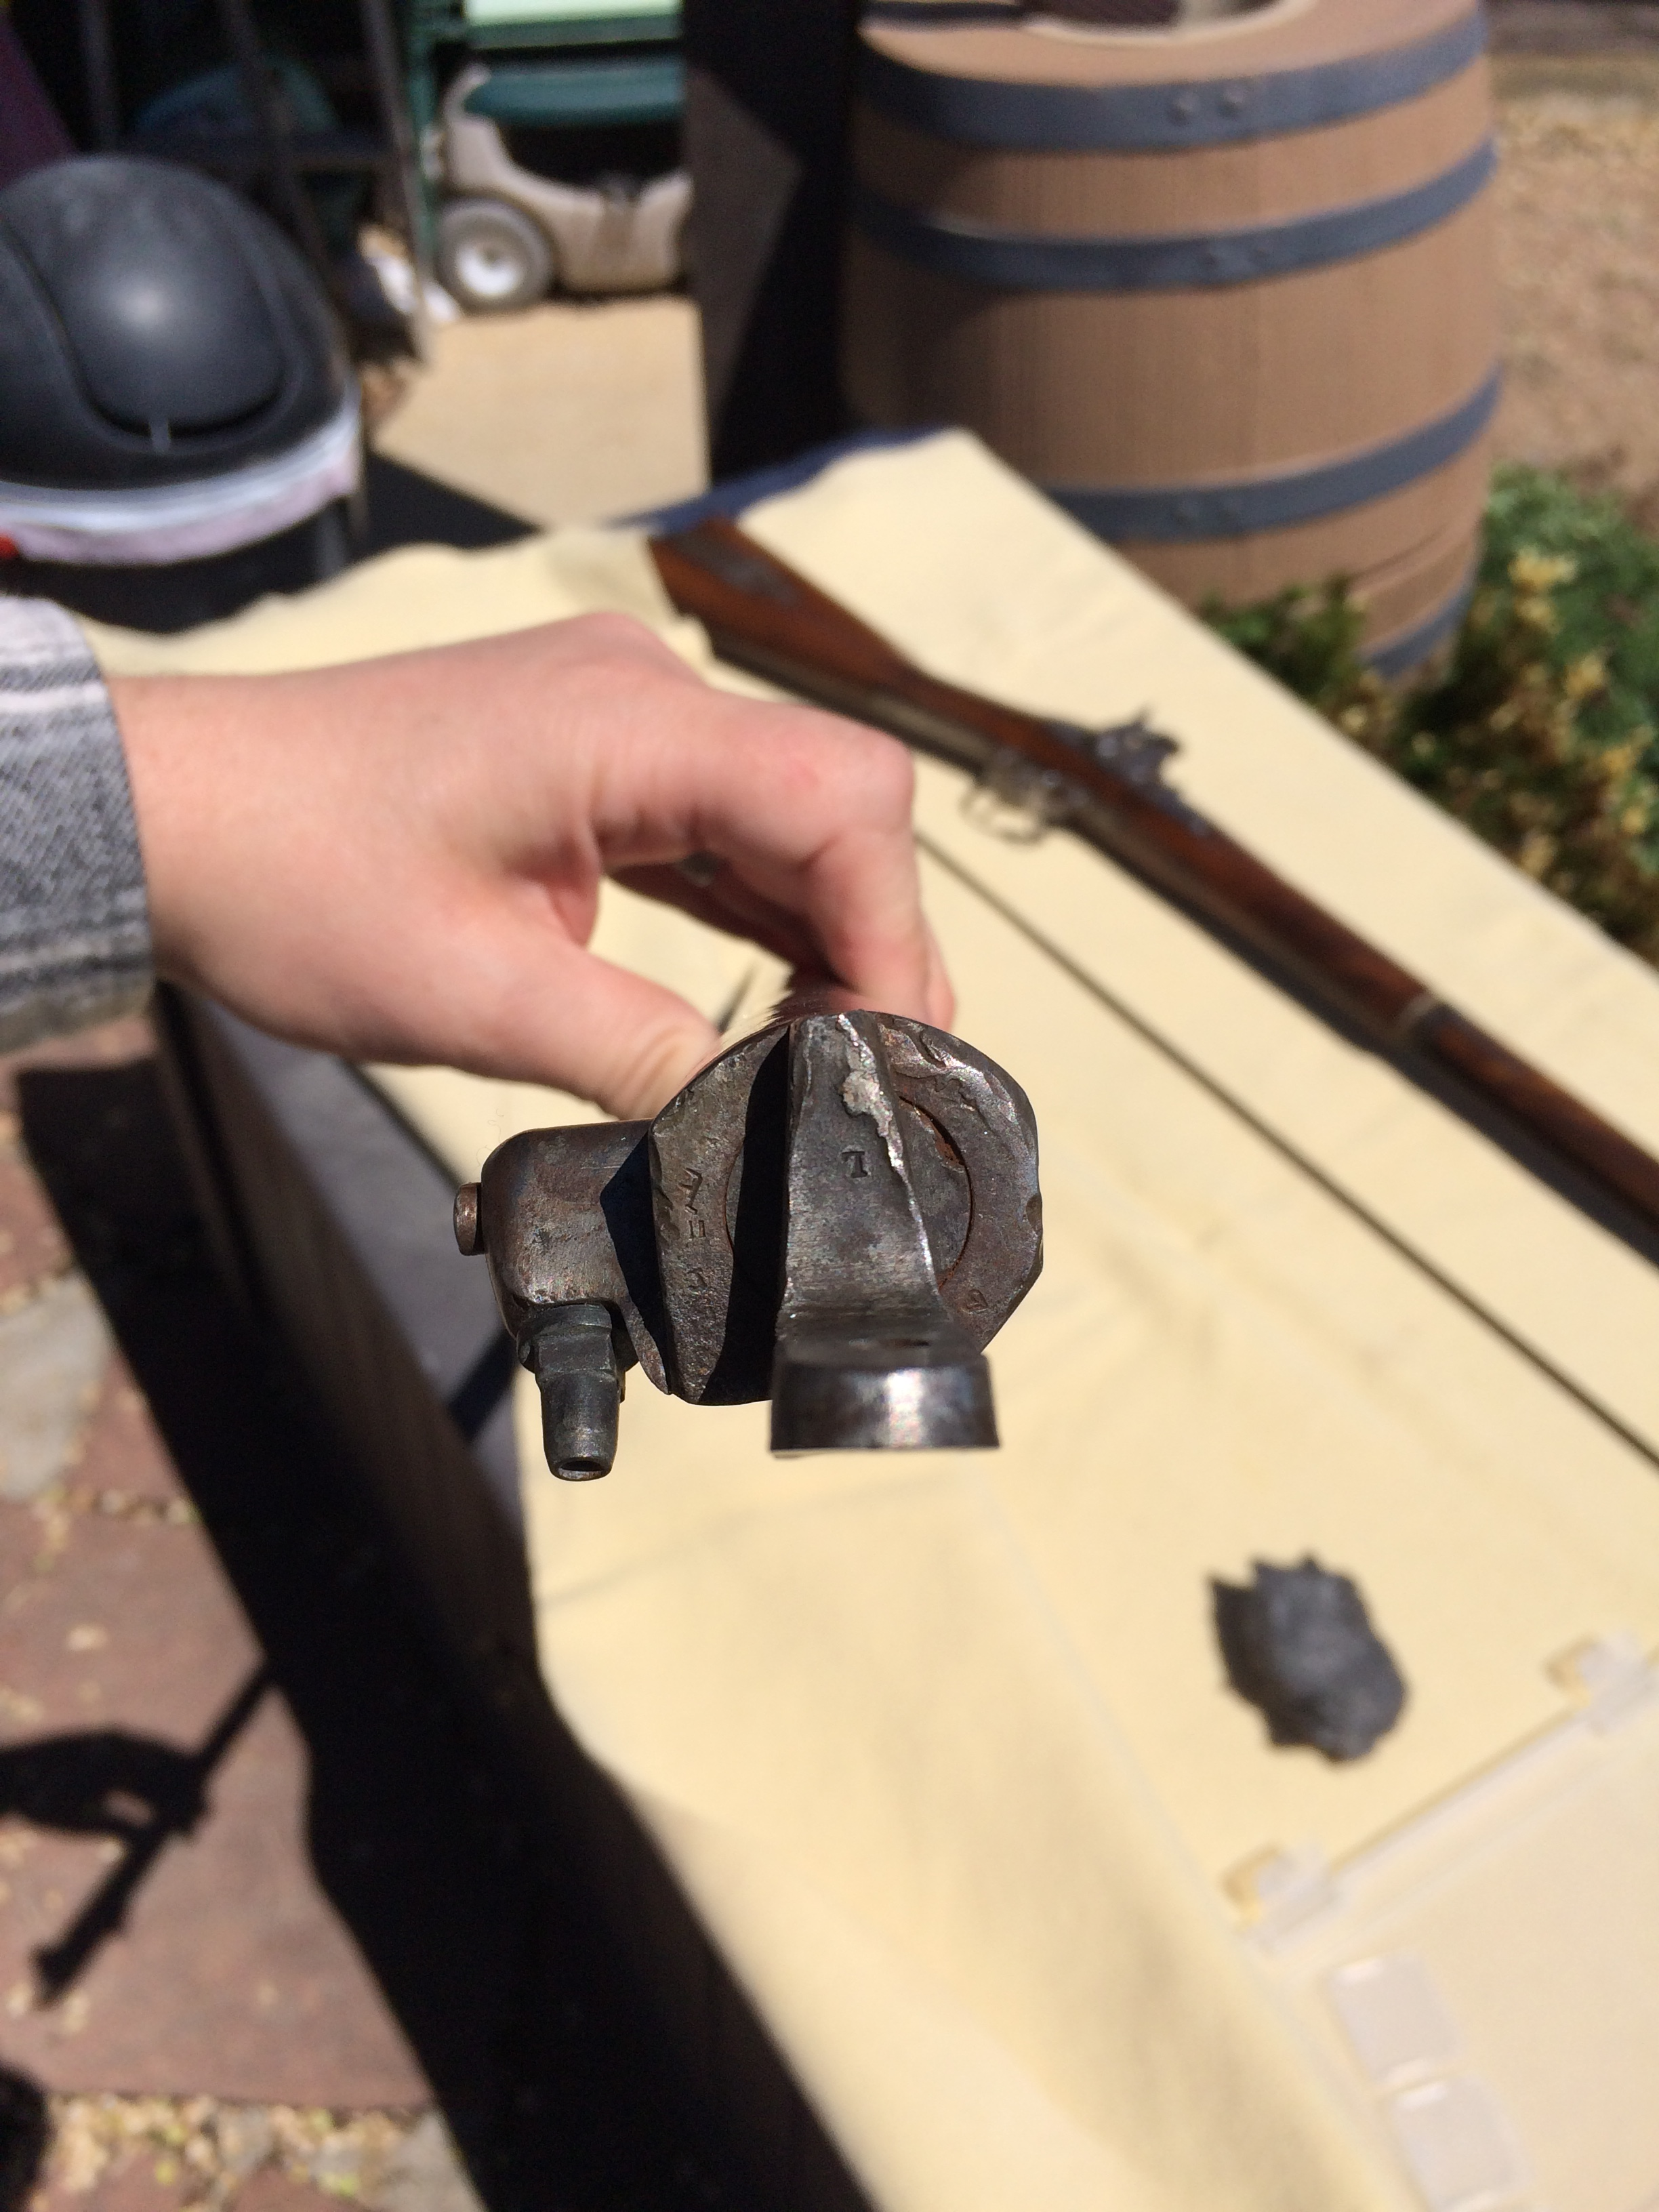 Breech Plug removal markings